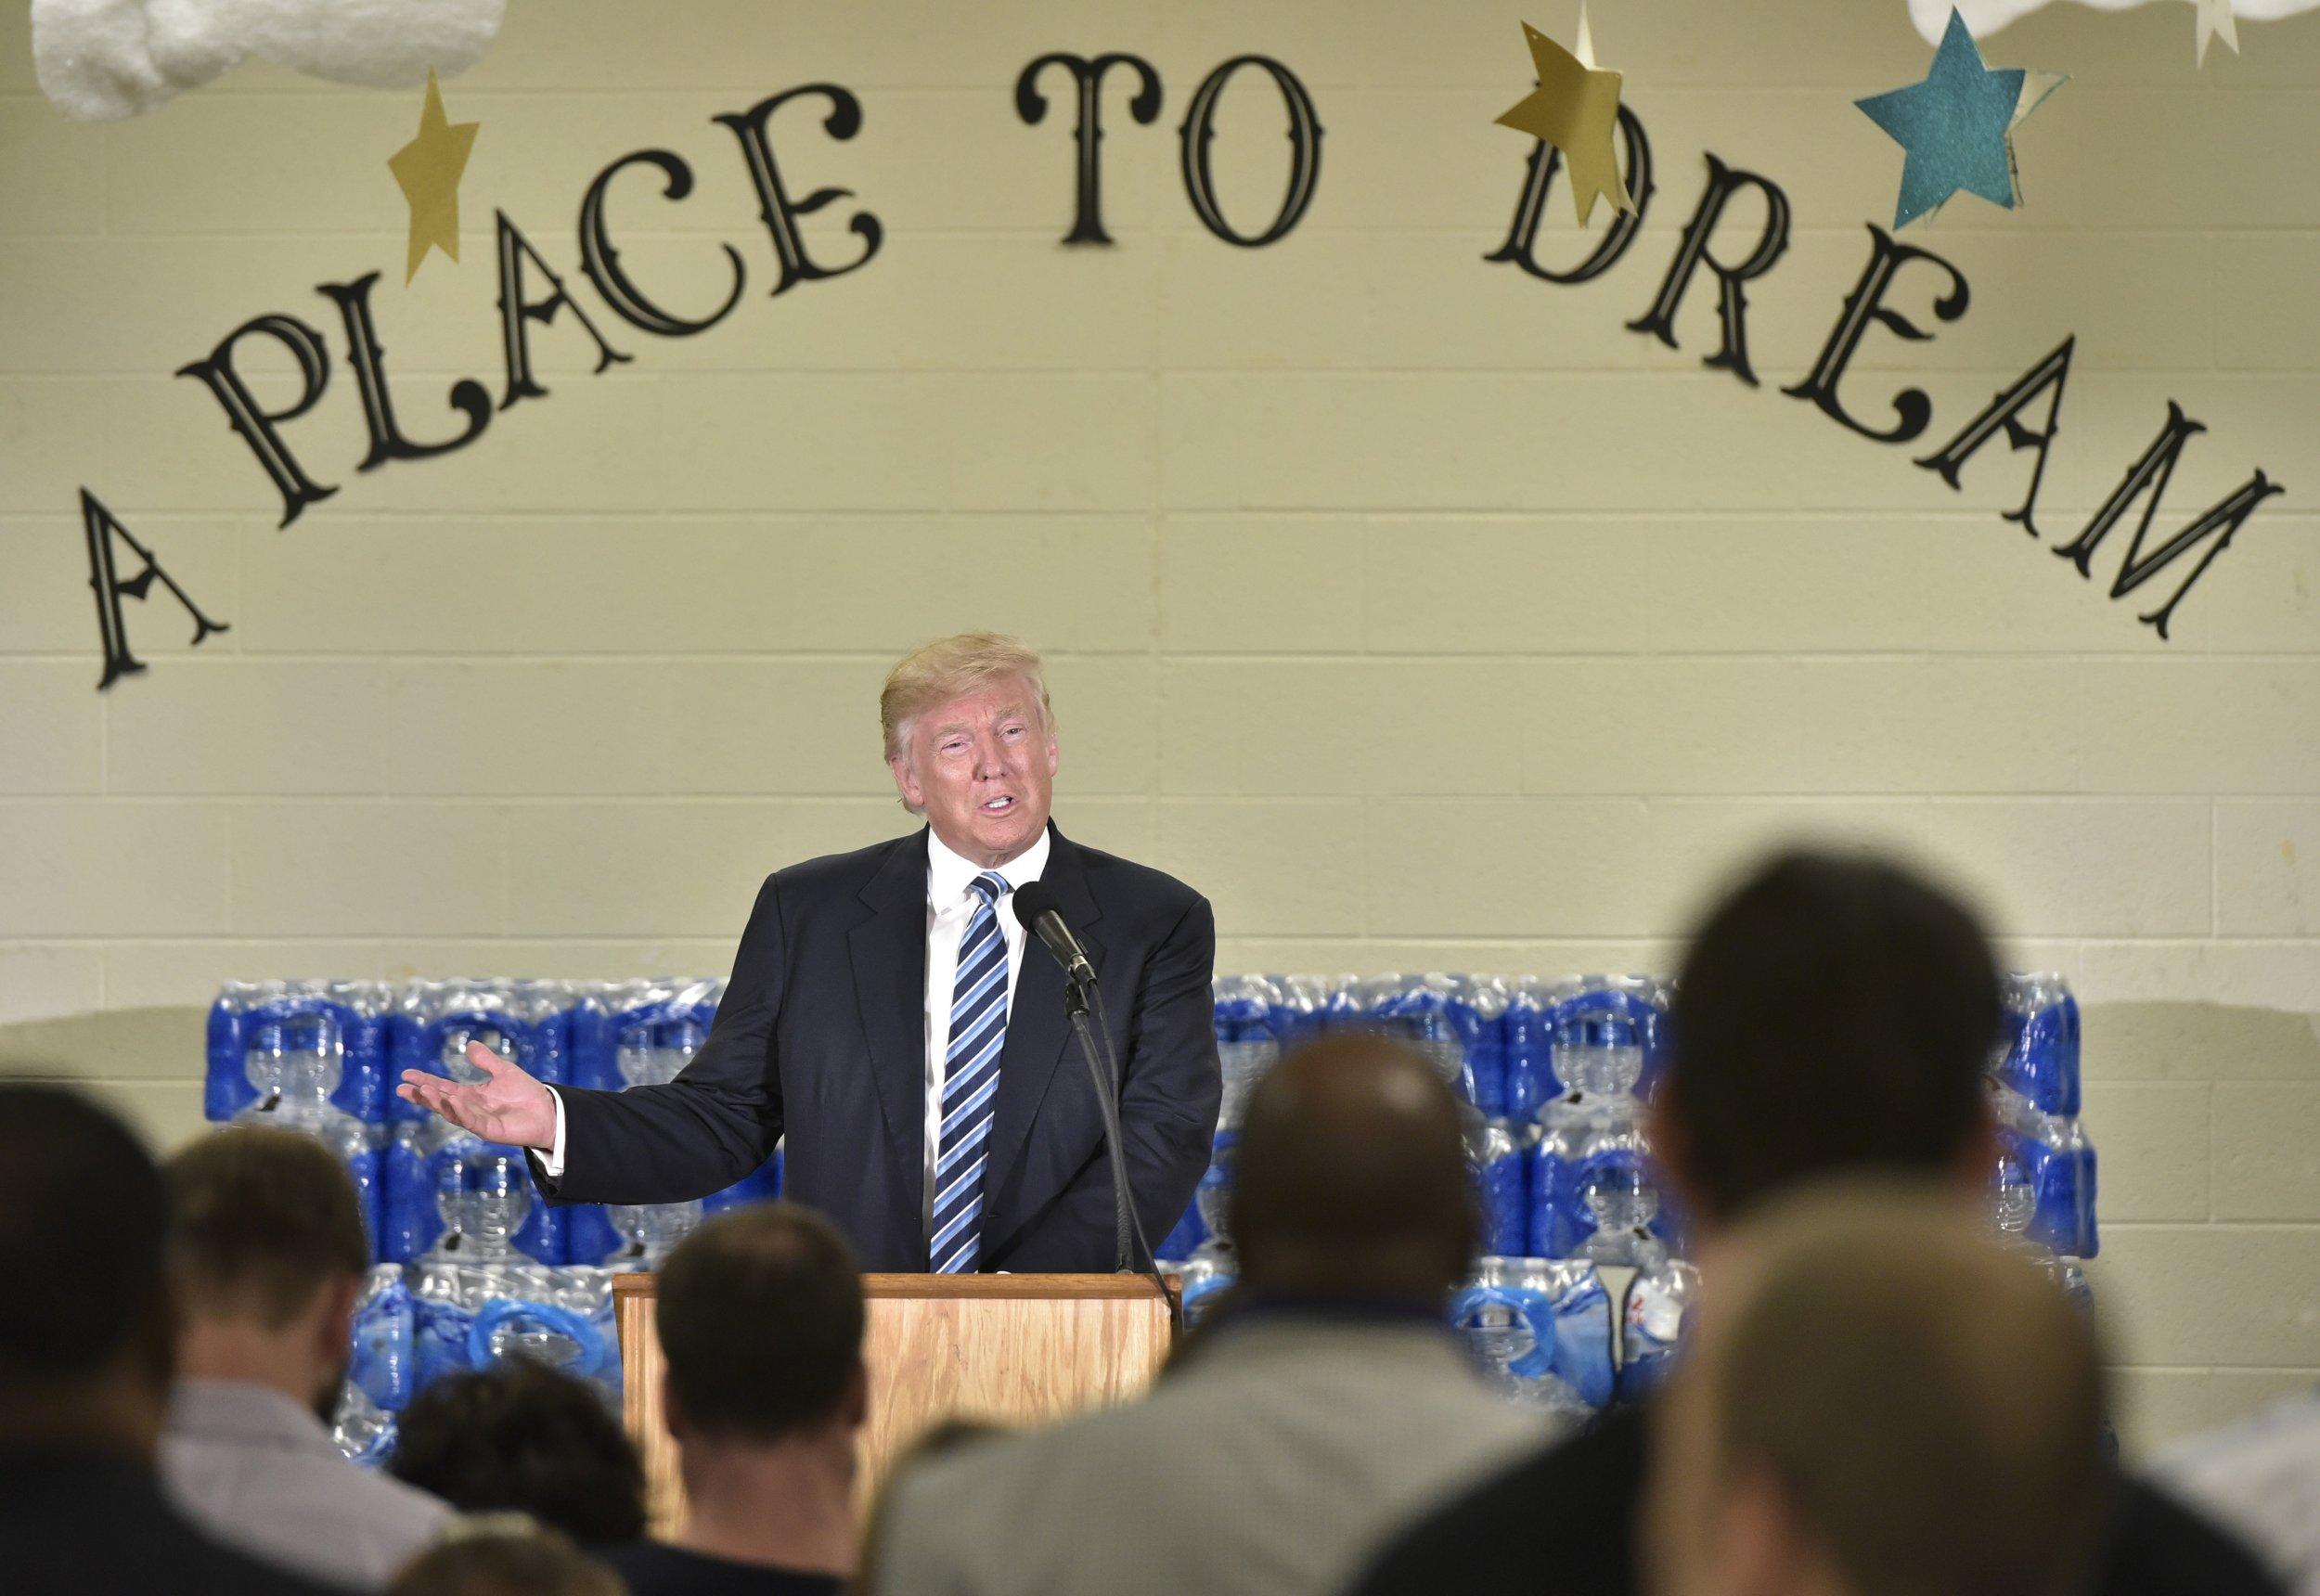 Donald Trump in Flint